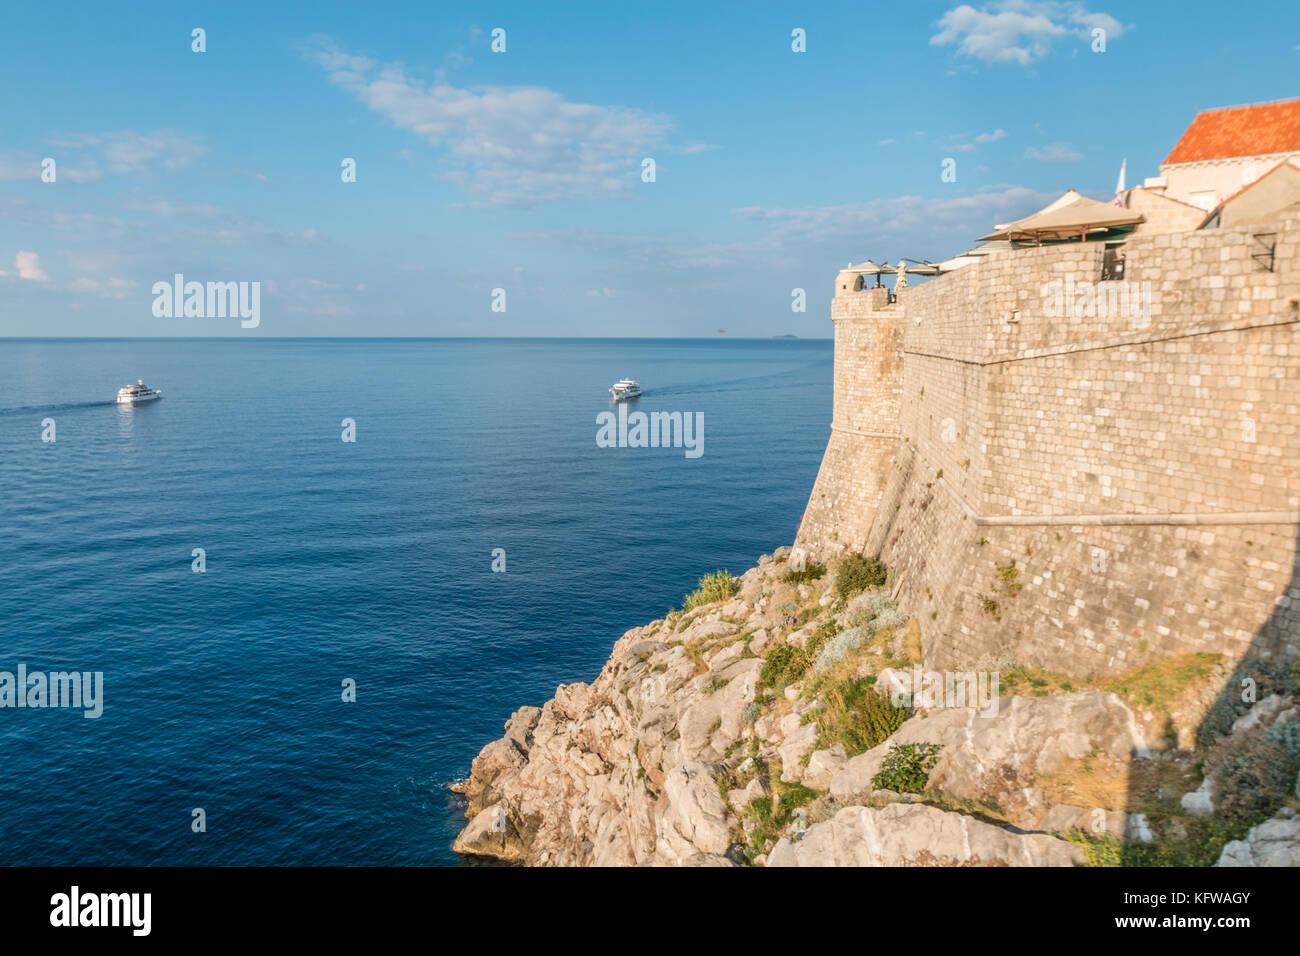 City walls of Dubrovnik Croatia - Stock Image